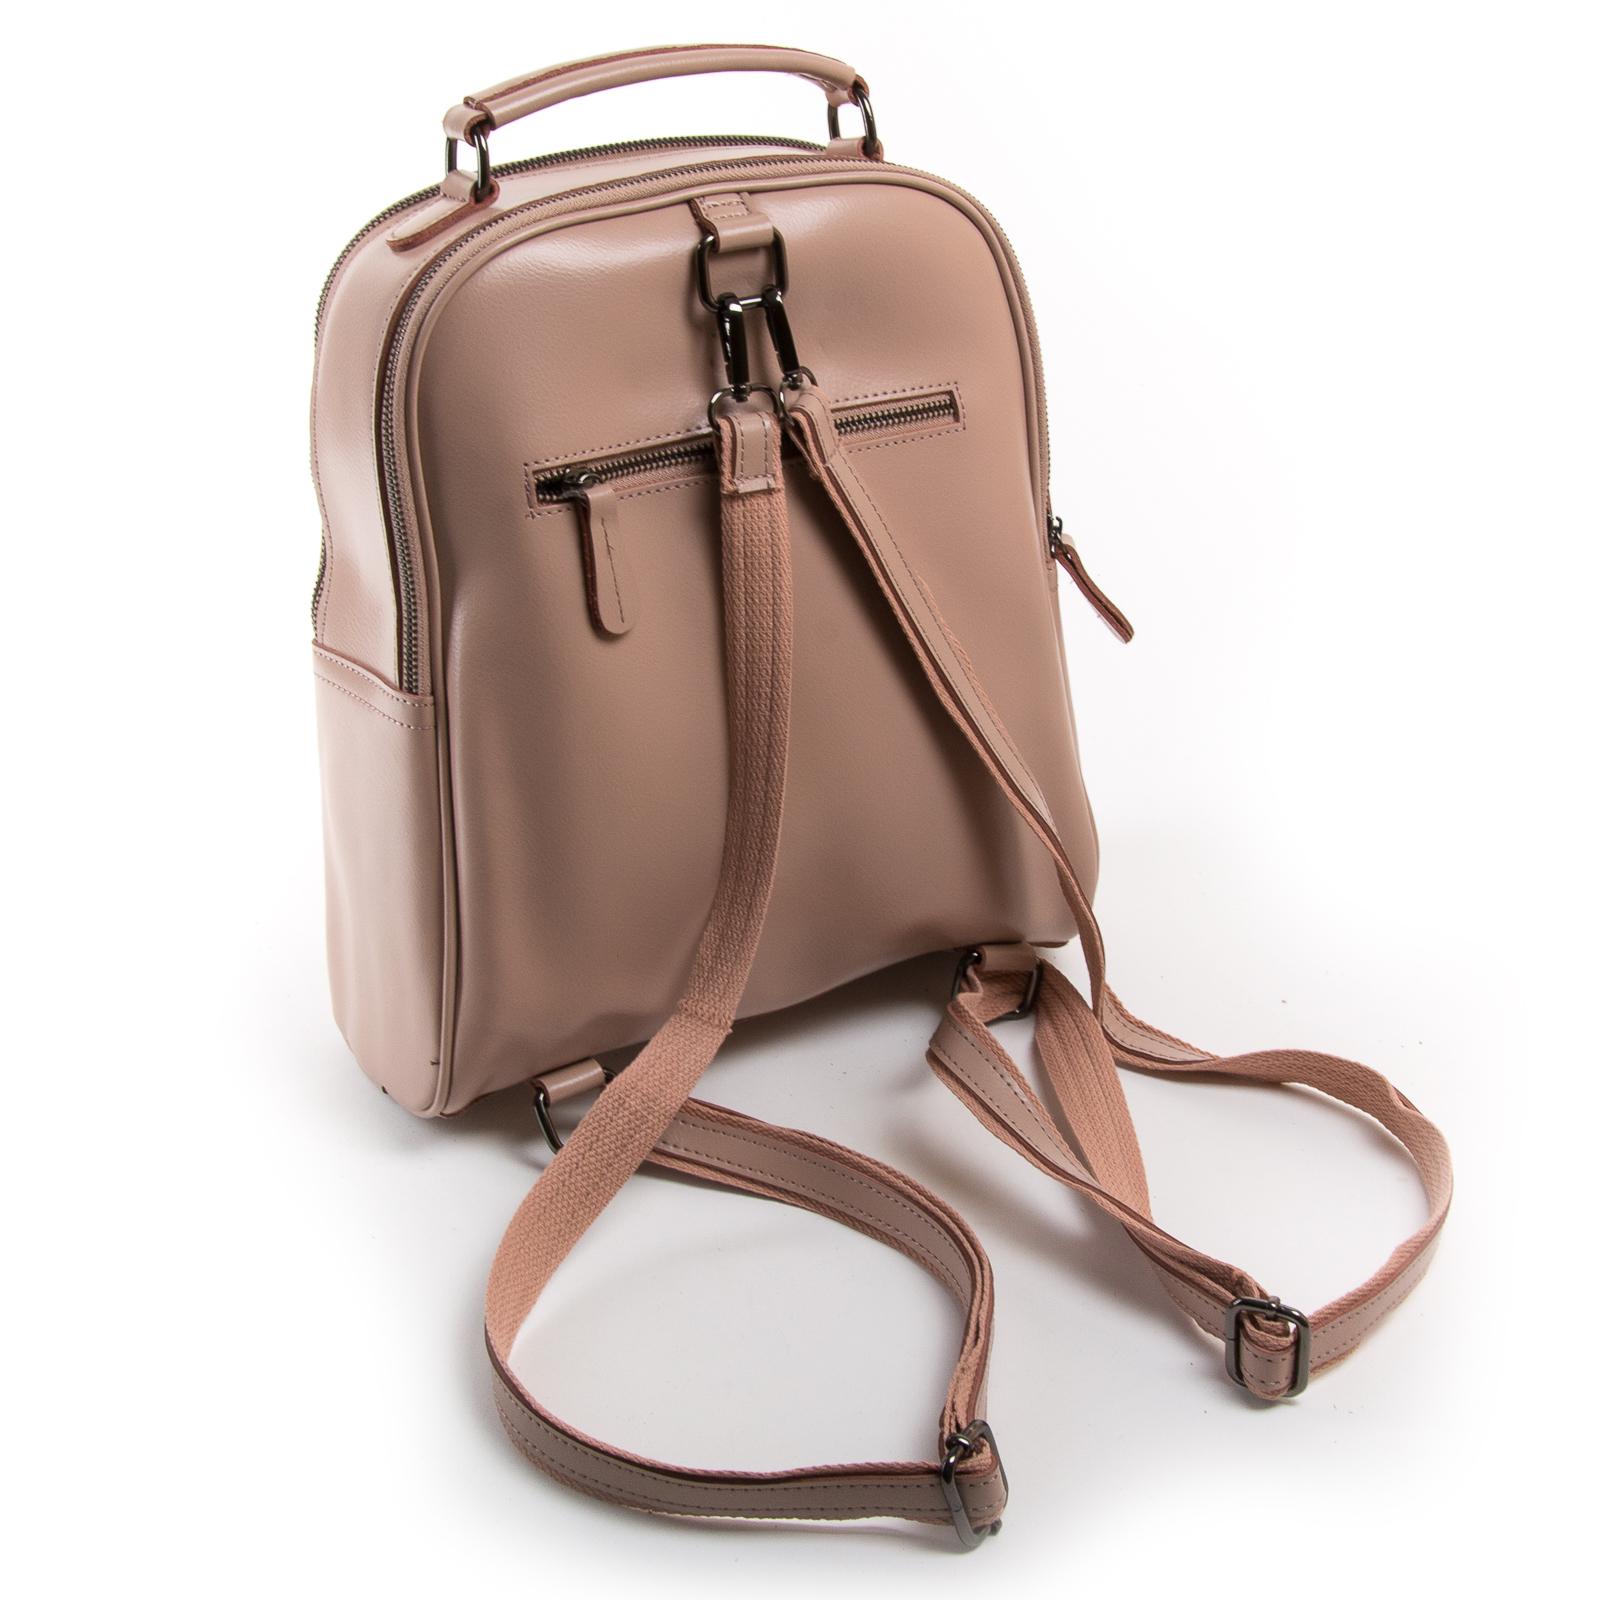 Сумка Женская Рюкзак кожа ALEX RAI 8694-3 pink - фото 4